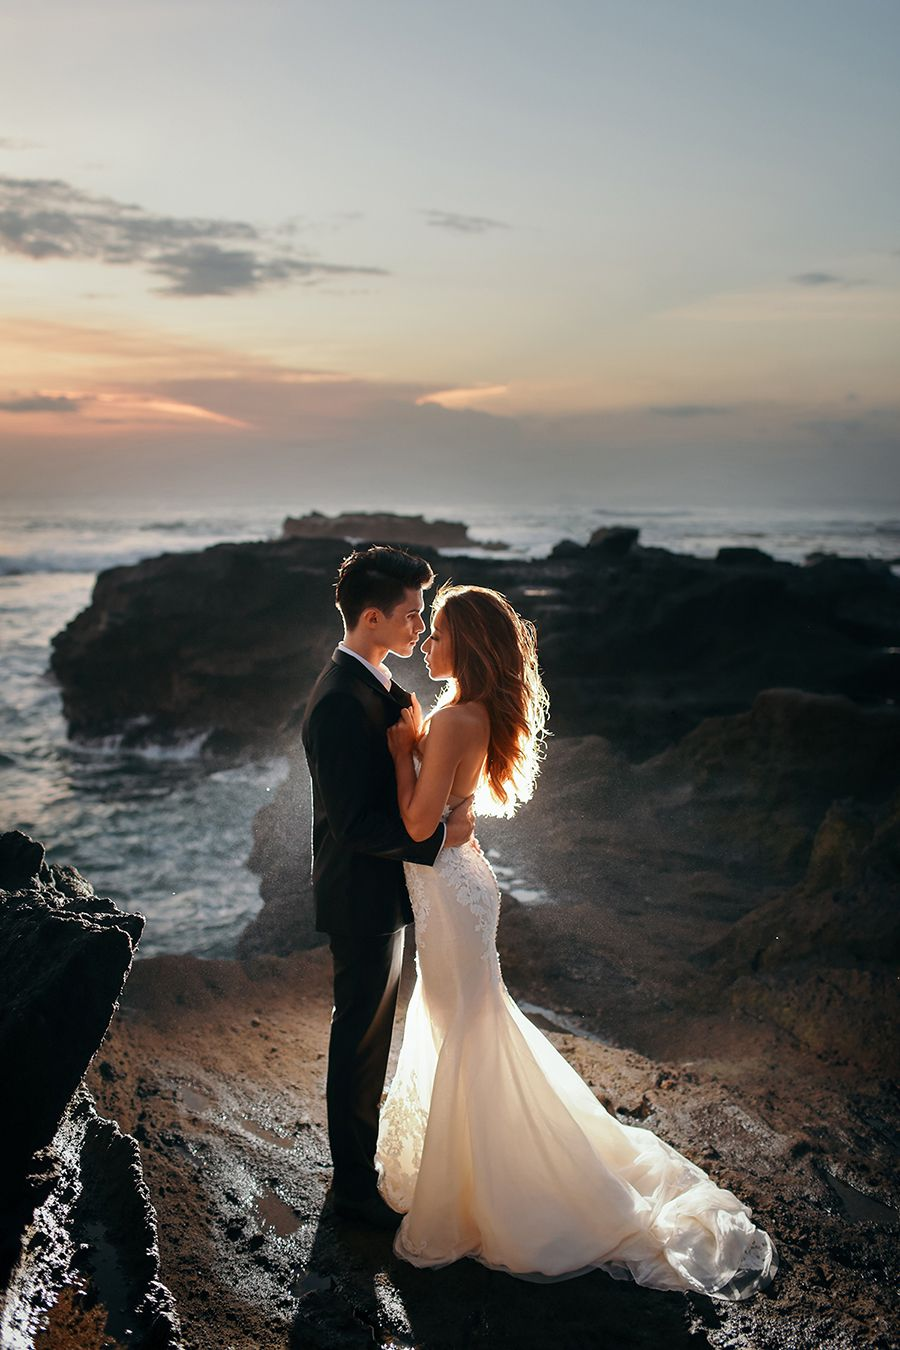 Joshua And Cheryl S Bali Engagement Shoot With A Secret Waterfall Beach Wedding Photography Wedding Gowns Mermaid Wedding Photography